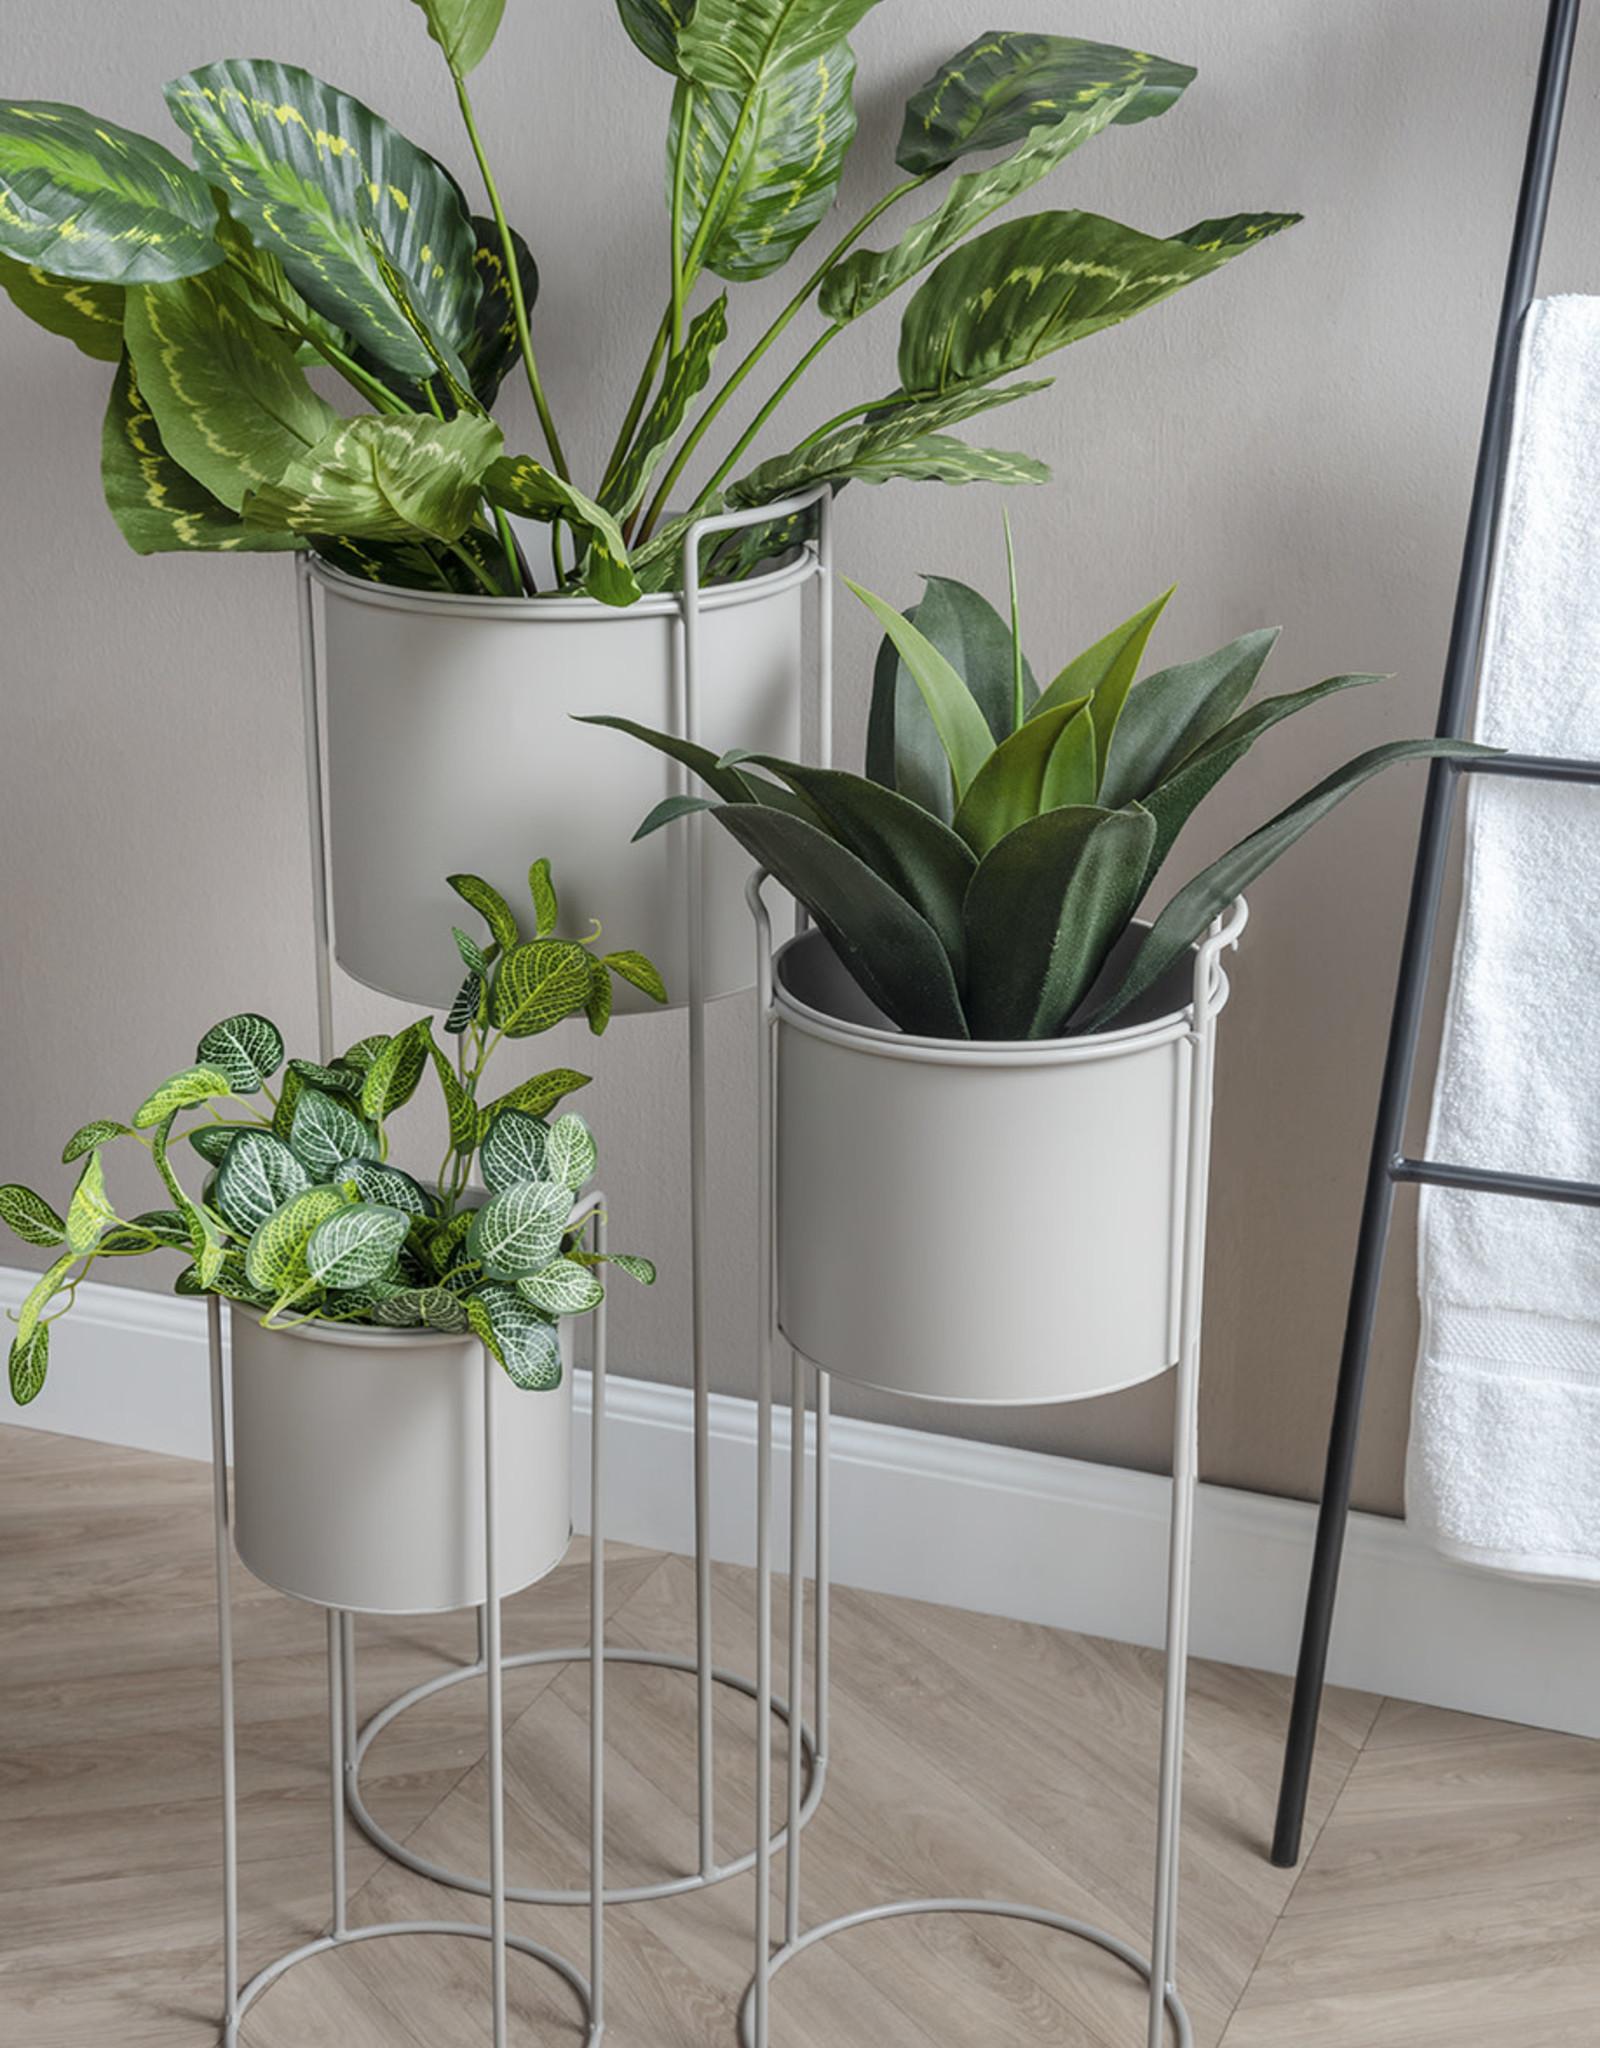 pt Iron planter on stand M [round] Ø17 h16, total height 47 - Warm grey